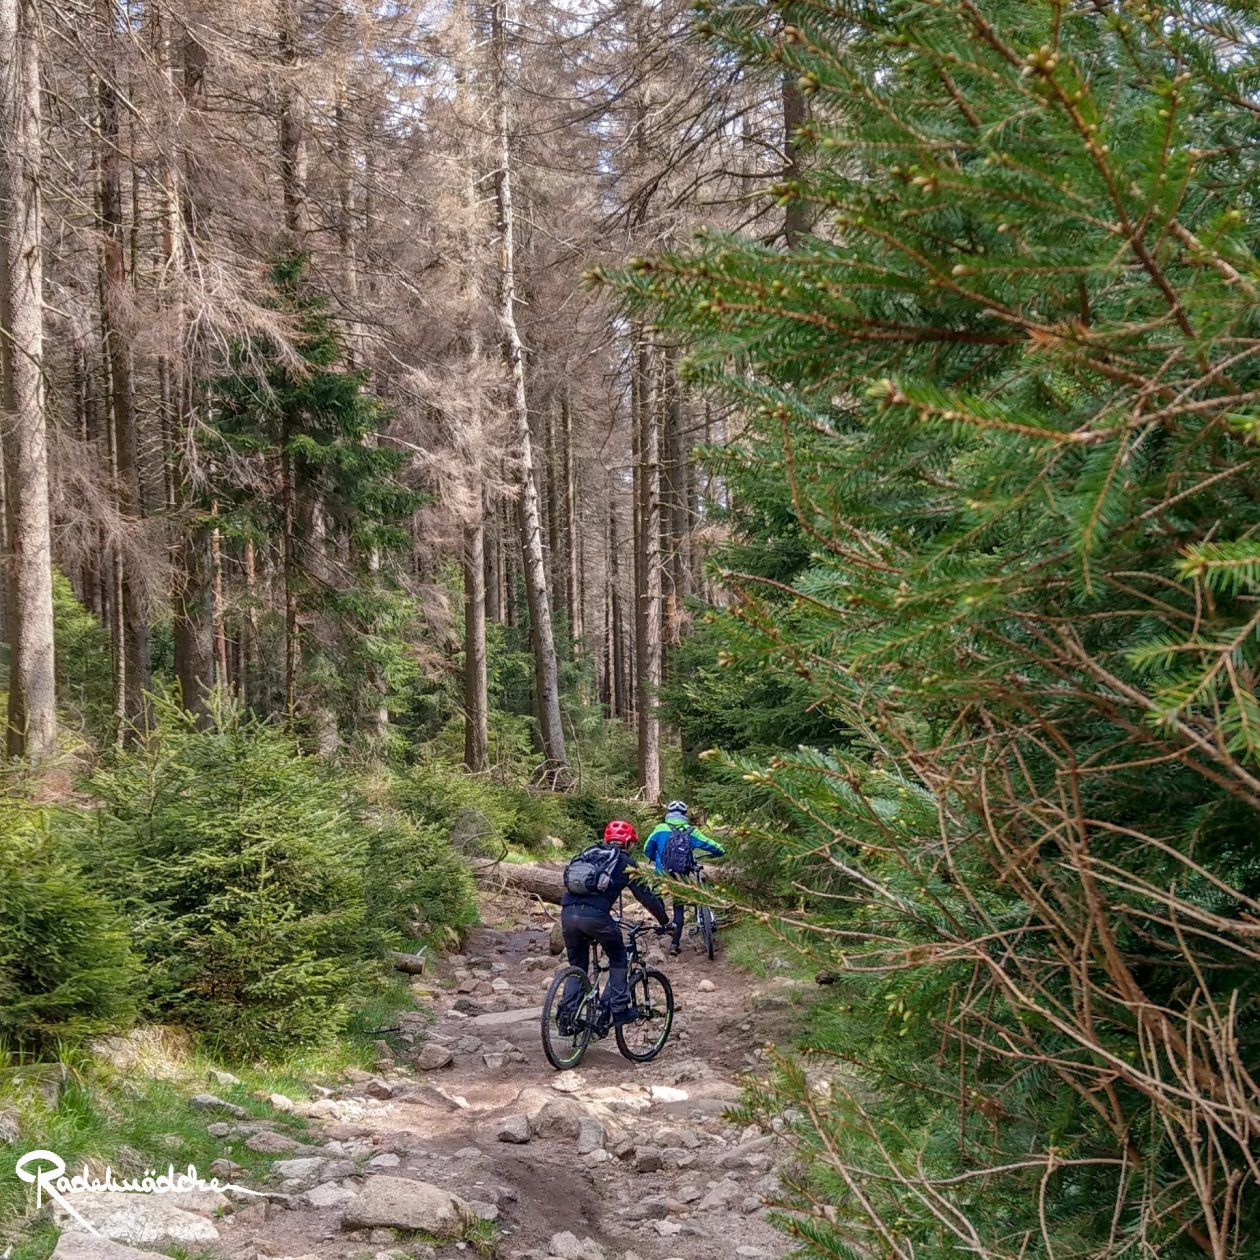 E-MTB-Mountainbike-Harz-Wernigerode-ebike-your-life_Radelmaedchen_Juliane-S-6